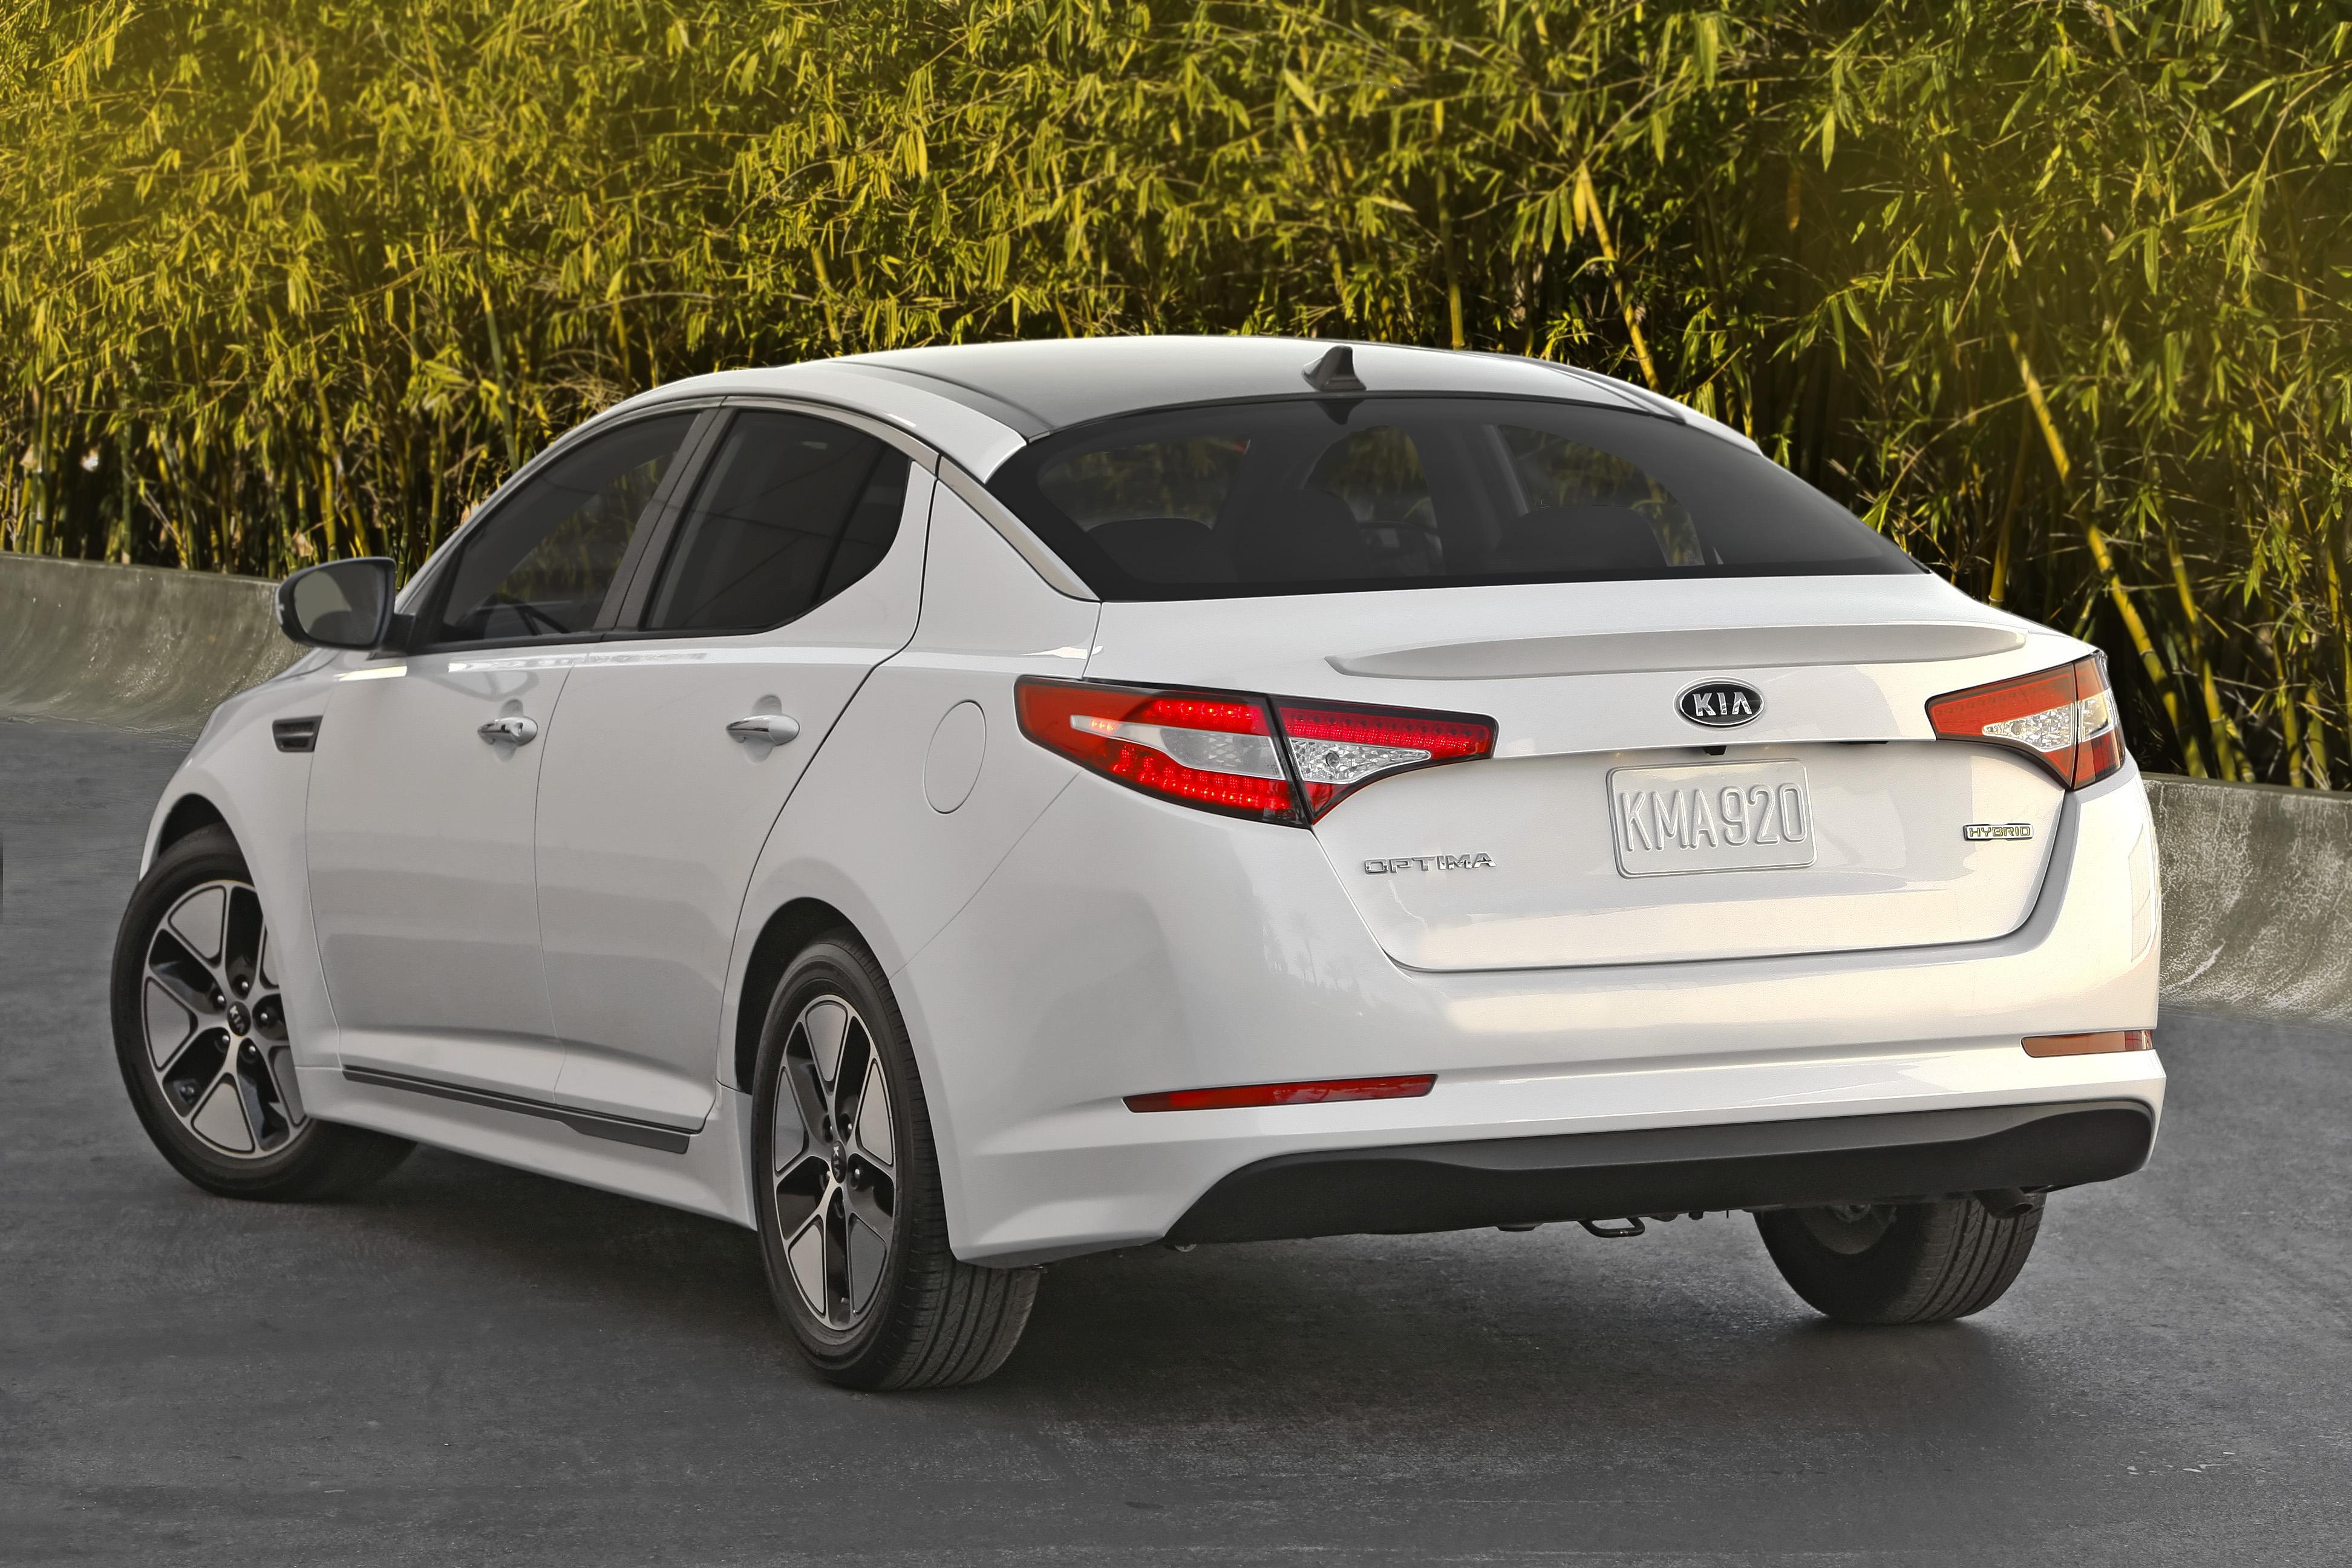 vis hyundai kia inventory l luxury ex vehicle leviko en optima used quebec pre owned in